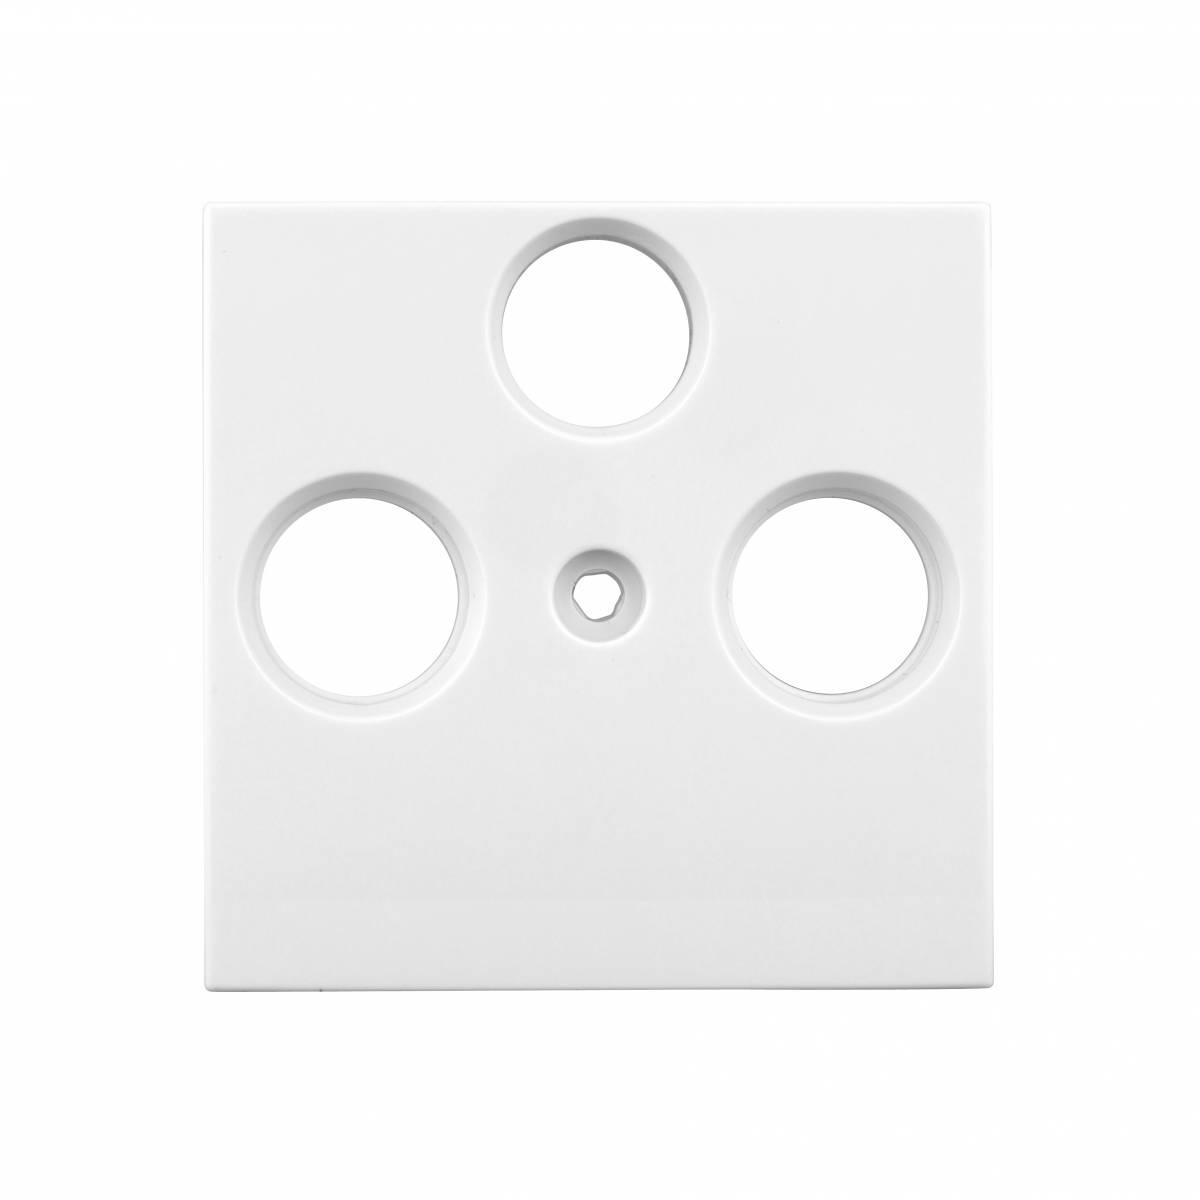 TV cover, 3-hole, white